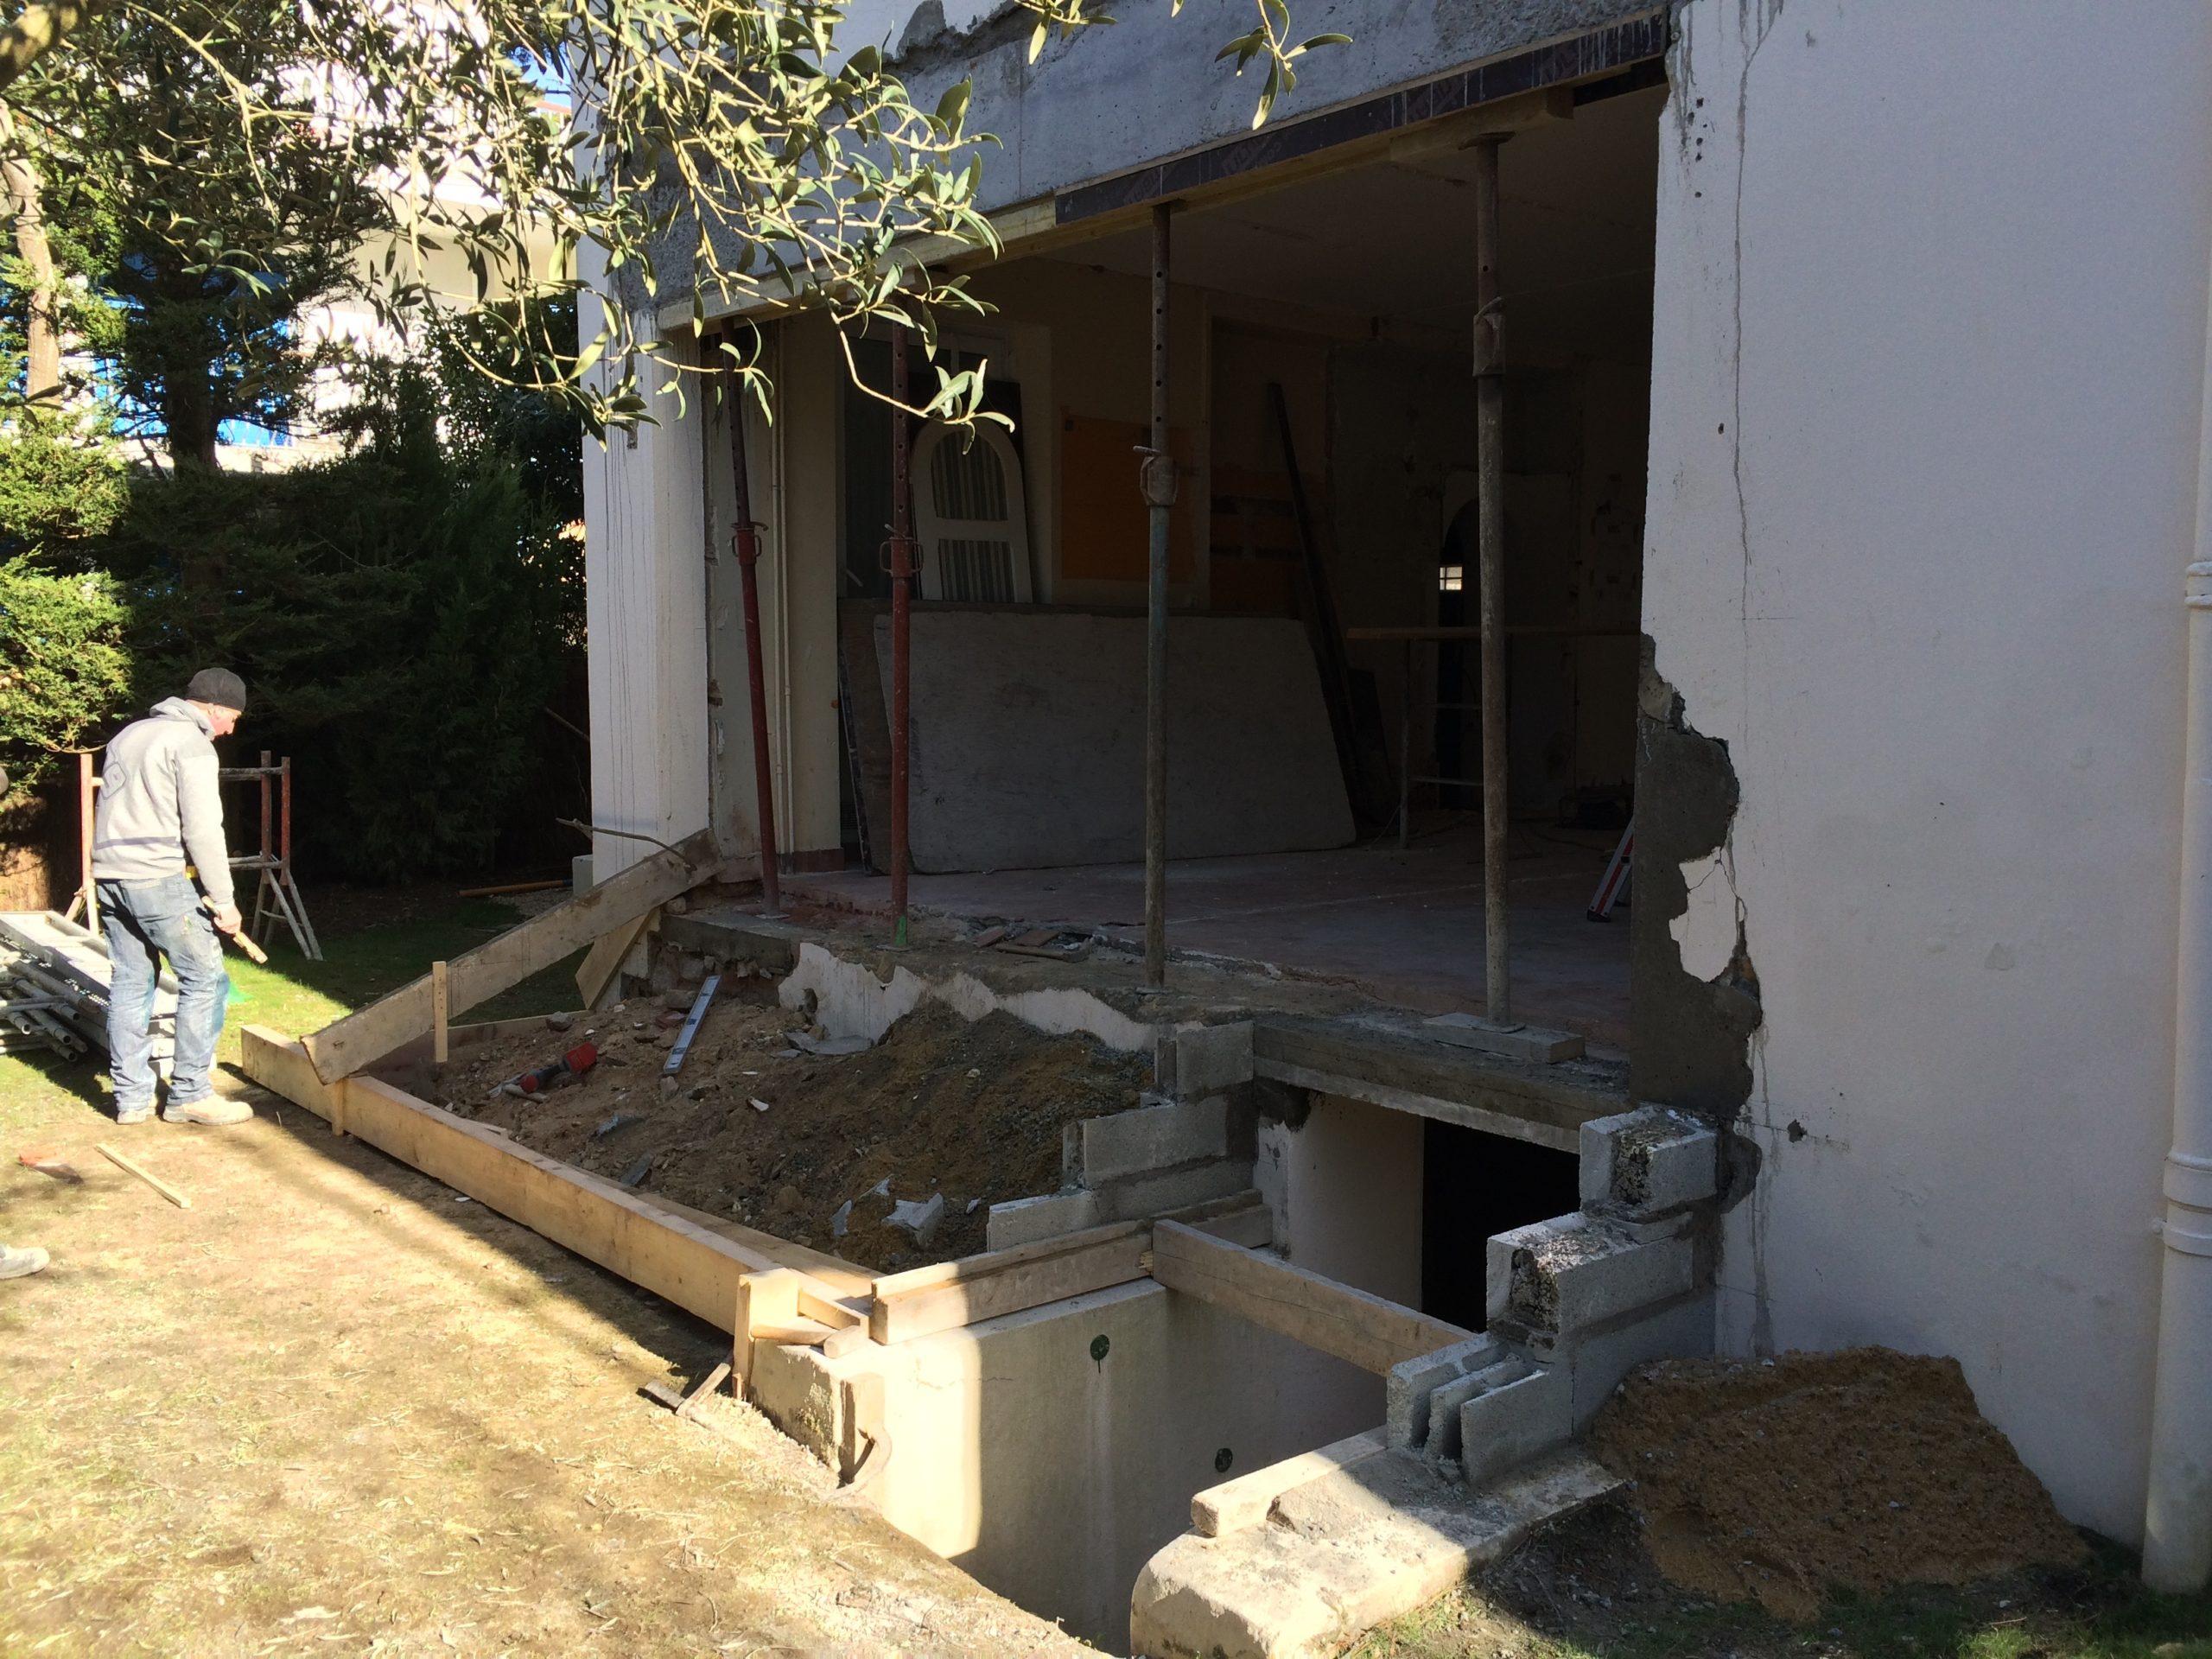 La Baule – Maison ARD gallery